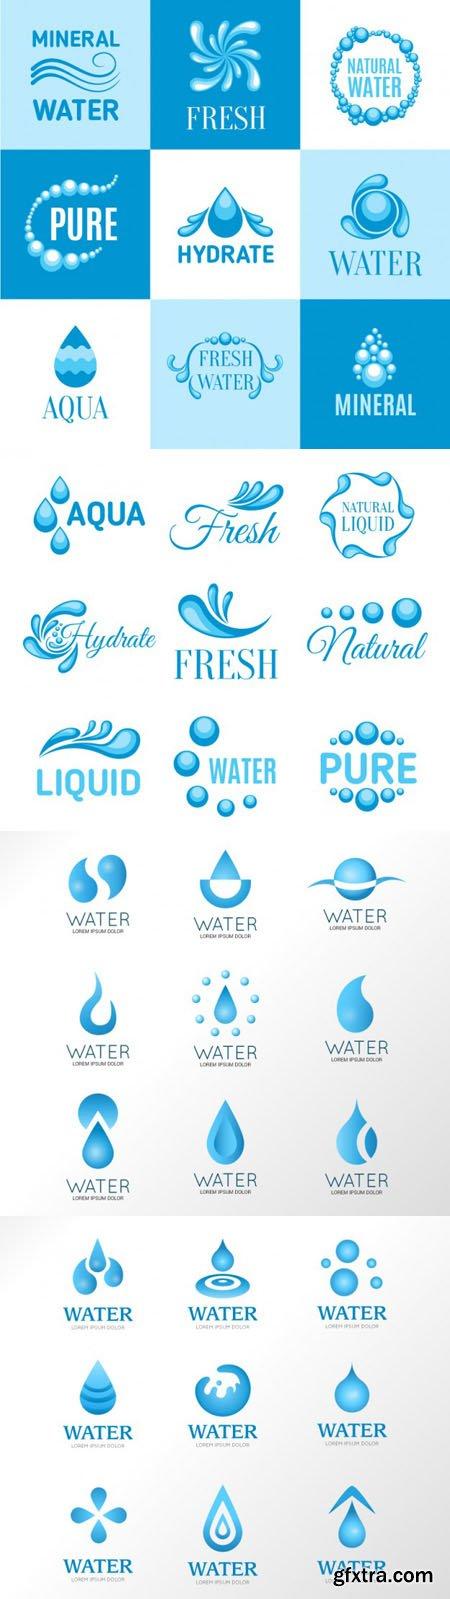 Variety of Water & Aqua Logos in Vector